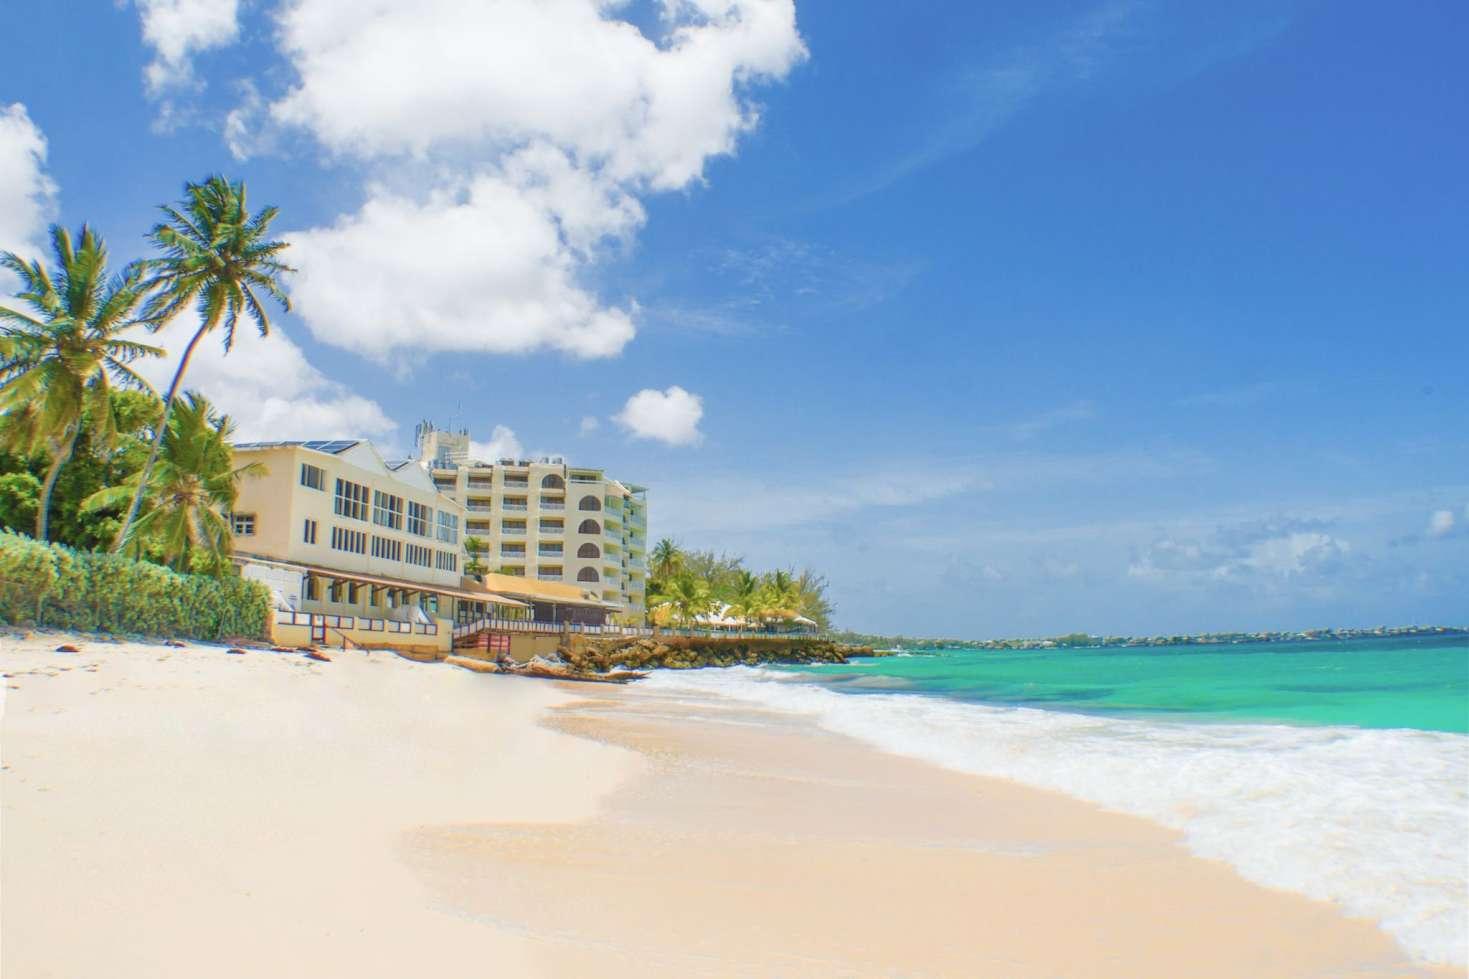 Barbados Beach Club, Christ Church, Barbados